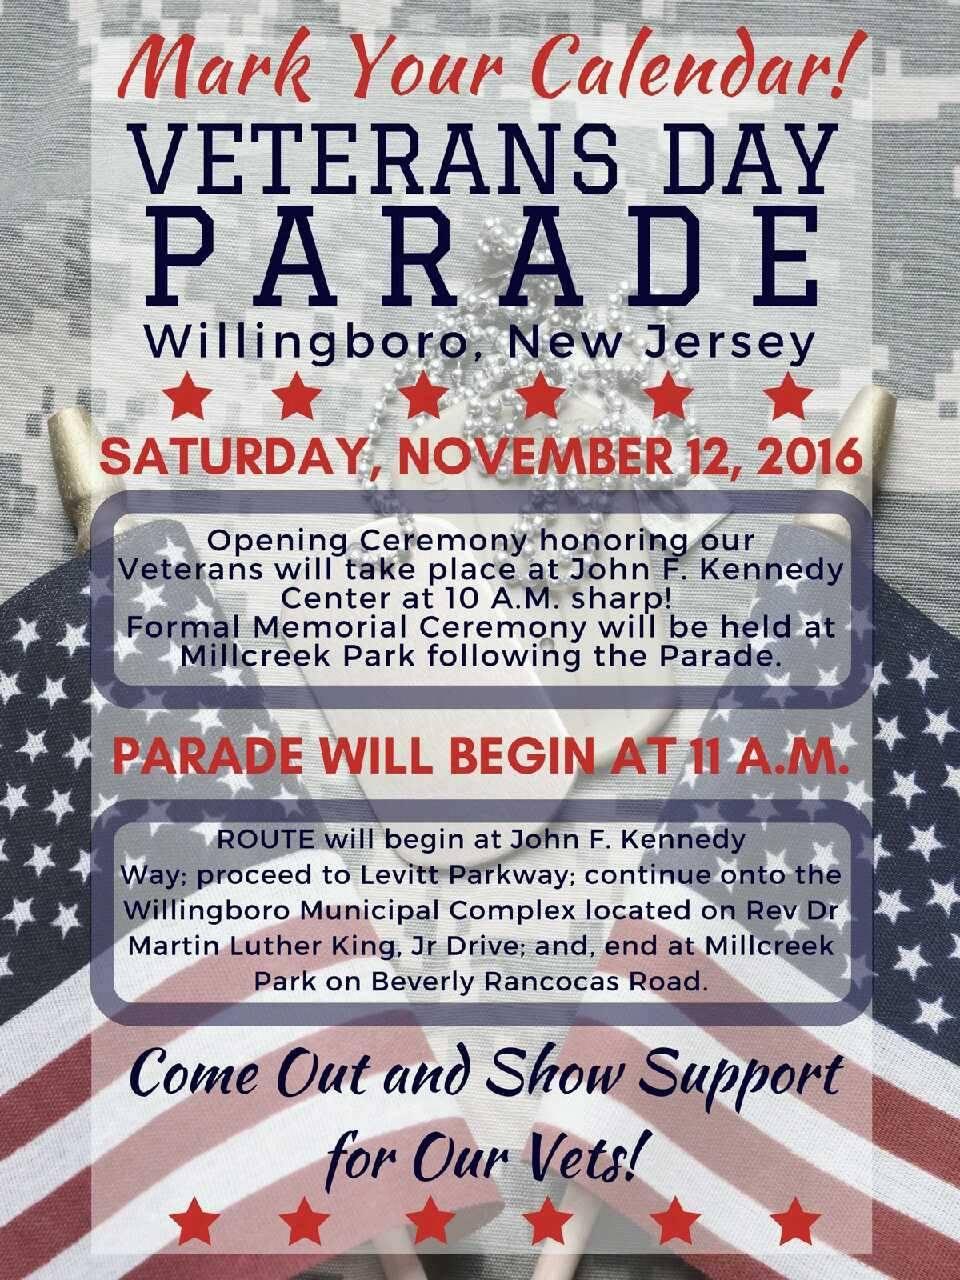 Veterans Day Parade -  Willingboro NJ